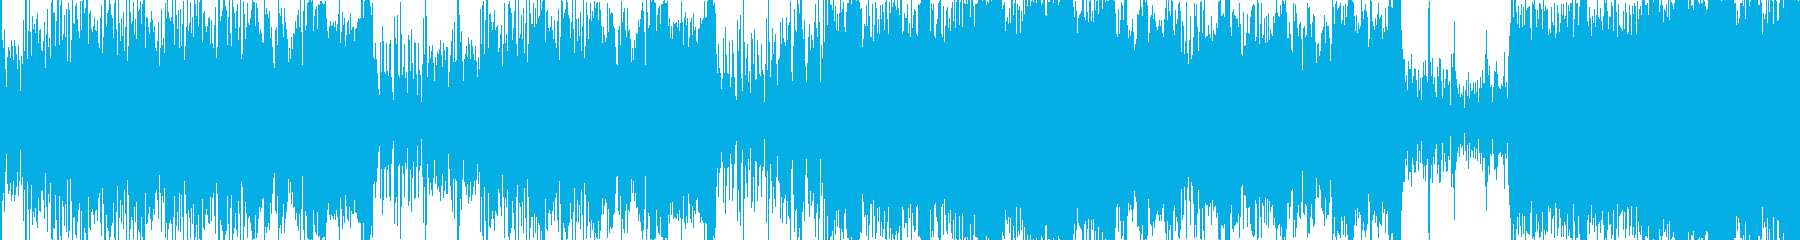 OP行進フルオーケストラ発表シリーズの再生済みの波形